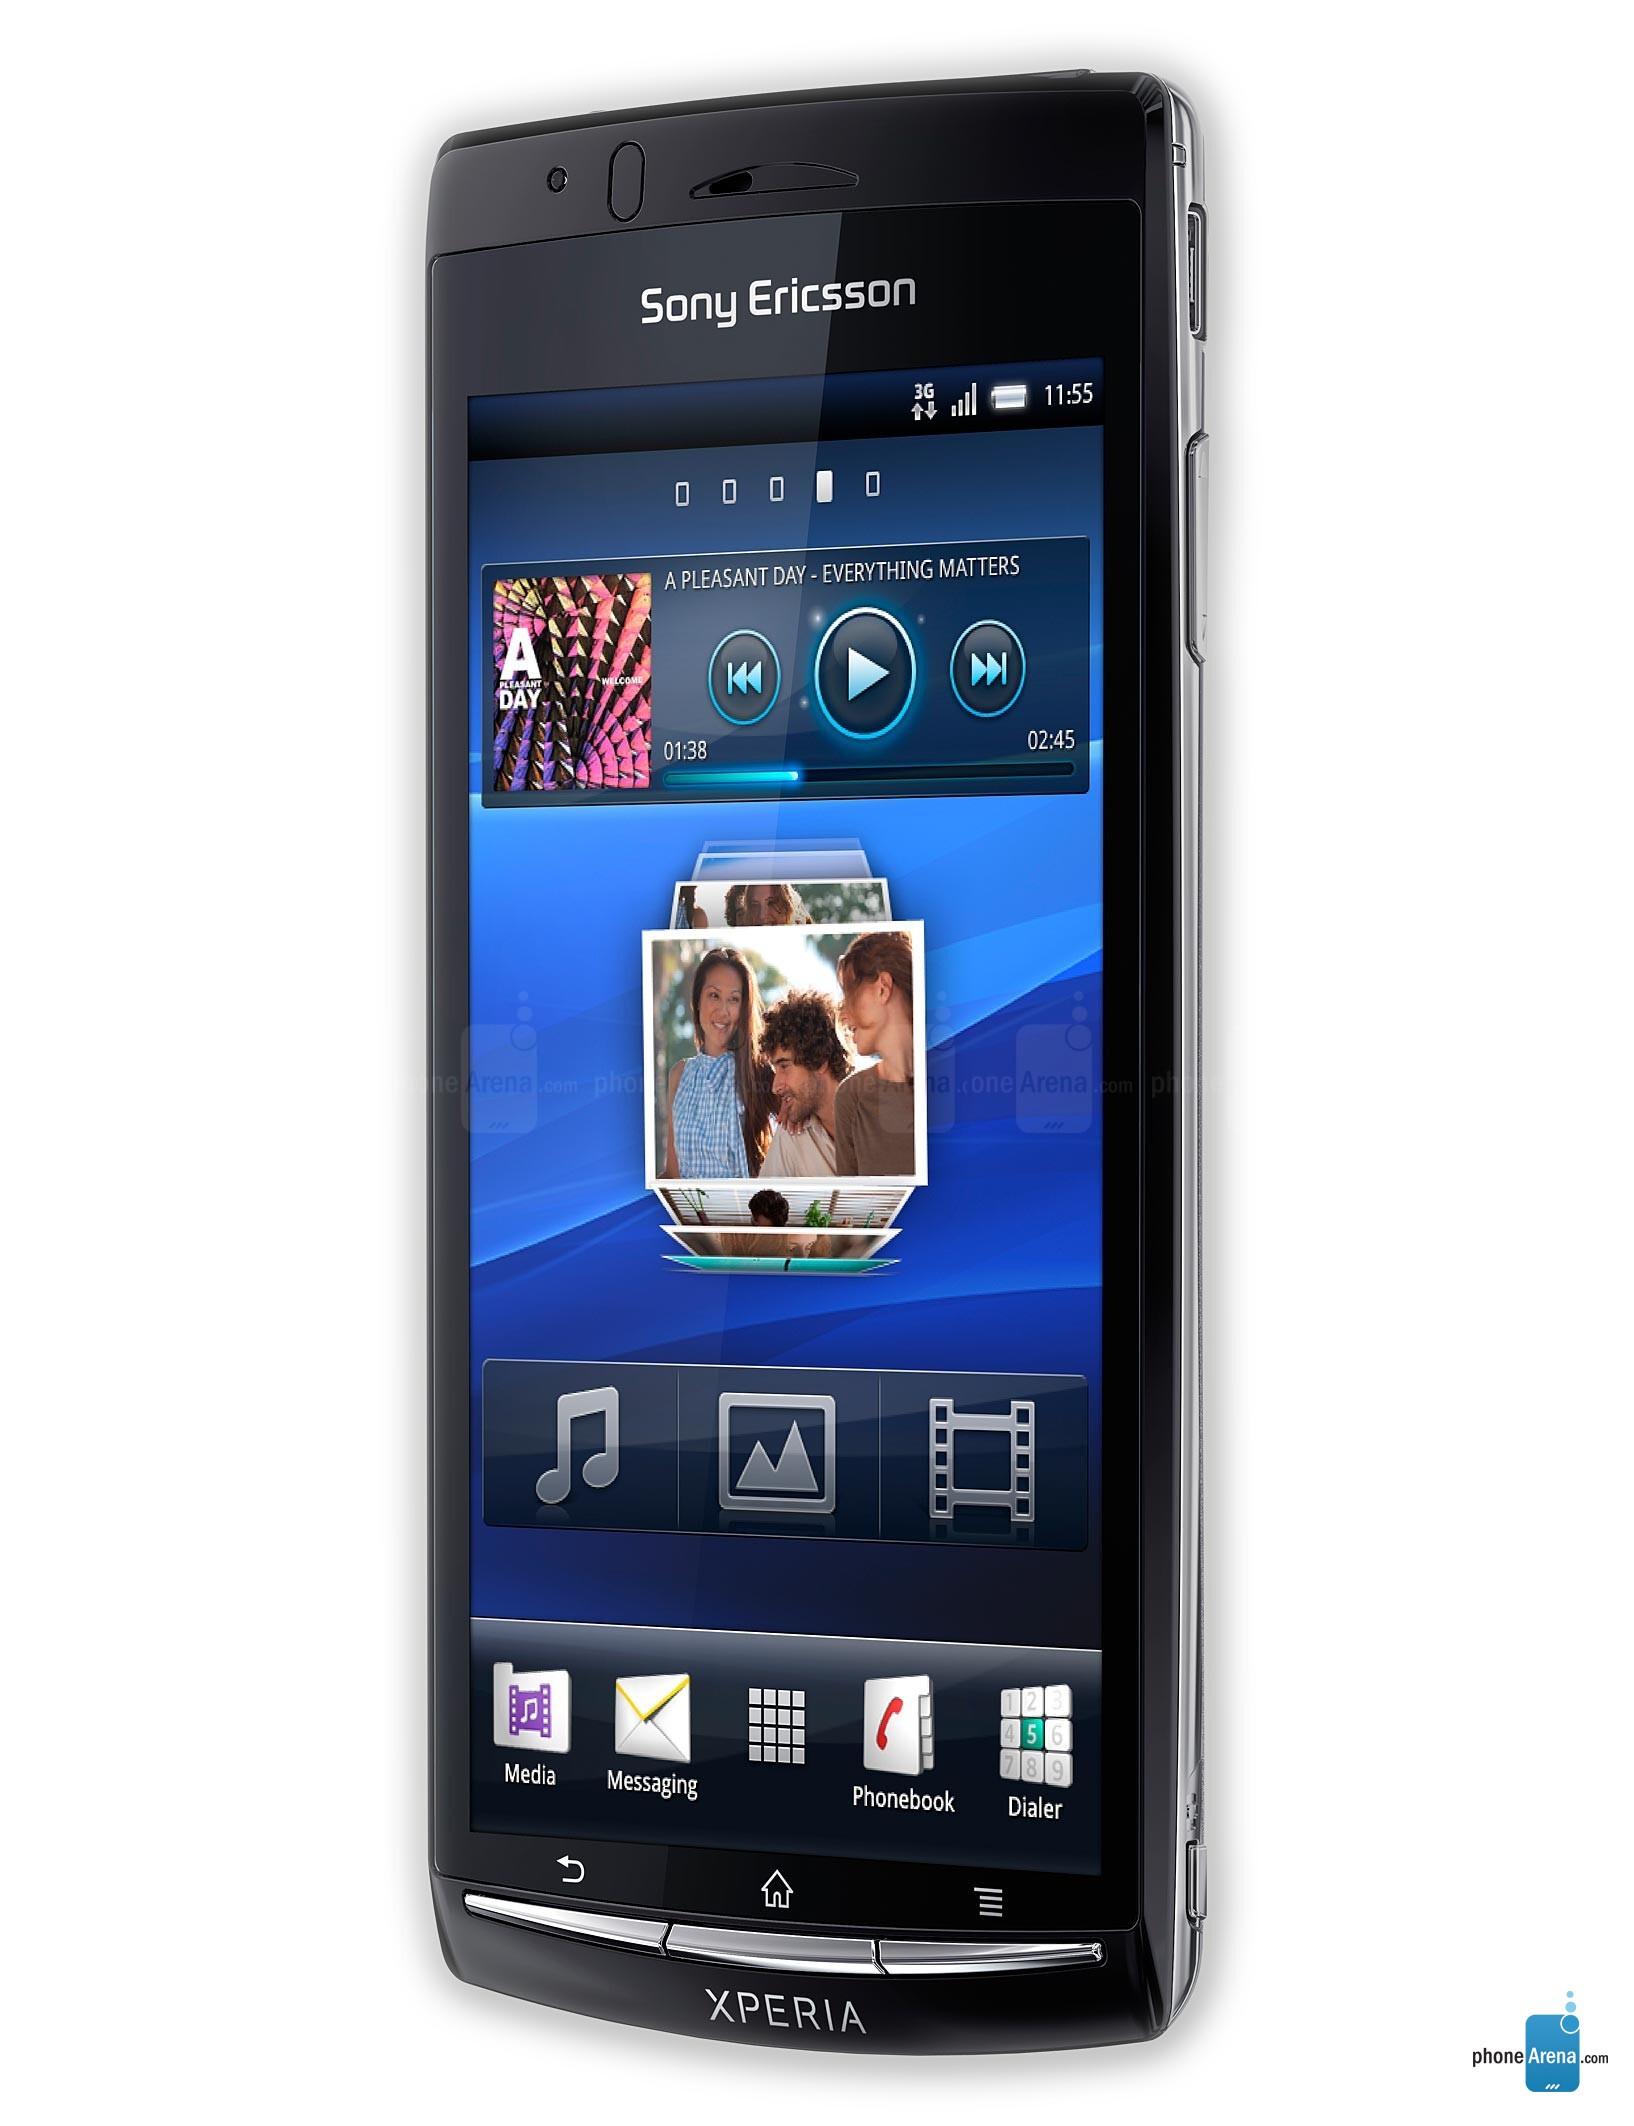 sony ericsson xperia arc photos rh phonearena com Sony Ericsson Xperia Ray Sony Ericsson Xperia Z